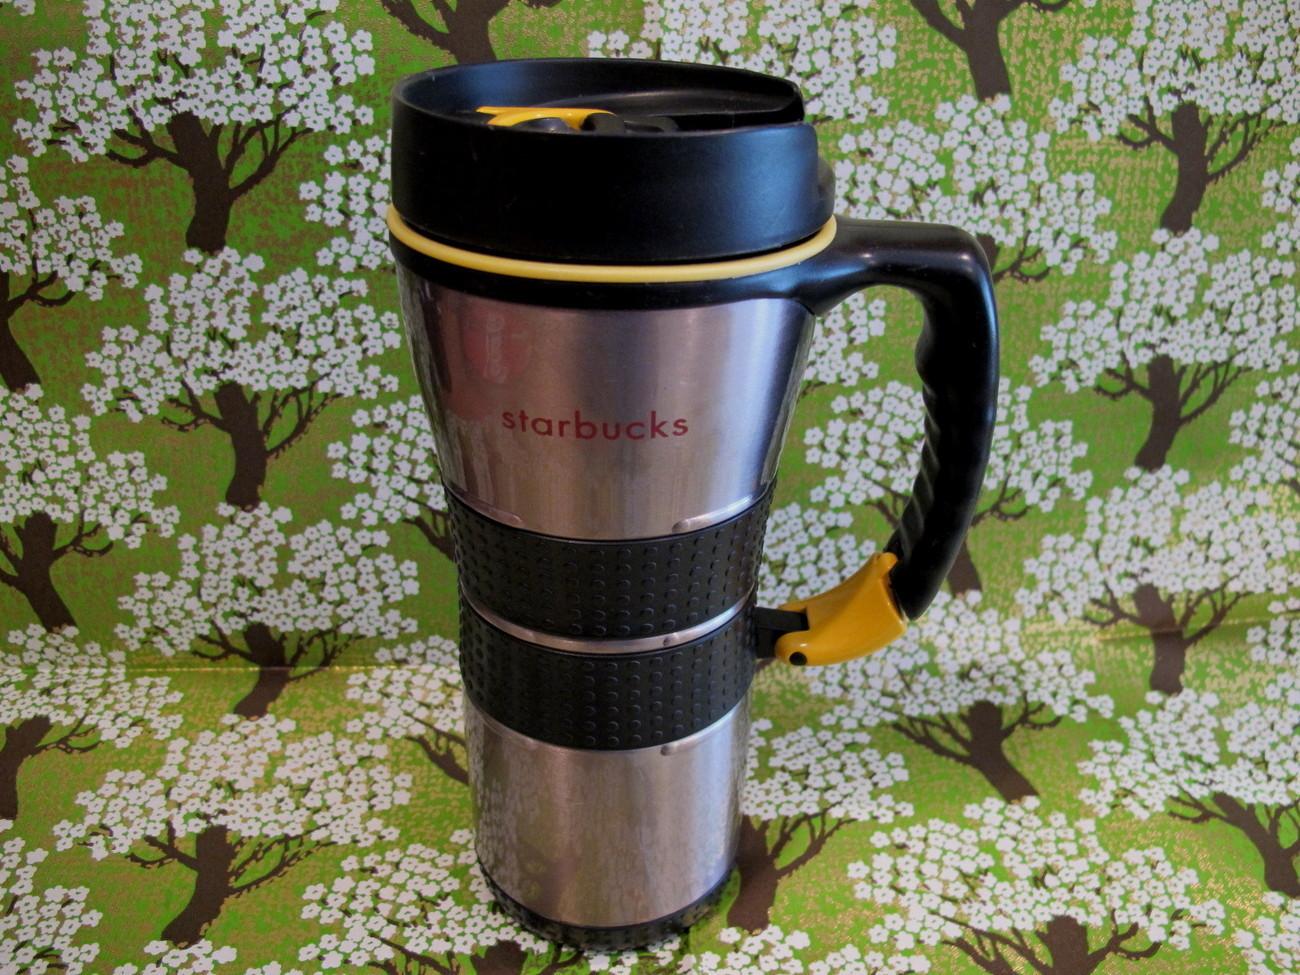 Starbucks Stainless Steel Coffee Mug Travel Cup Tumbler